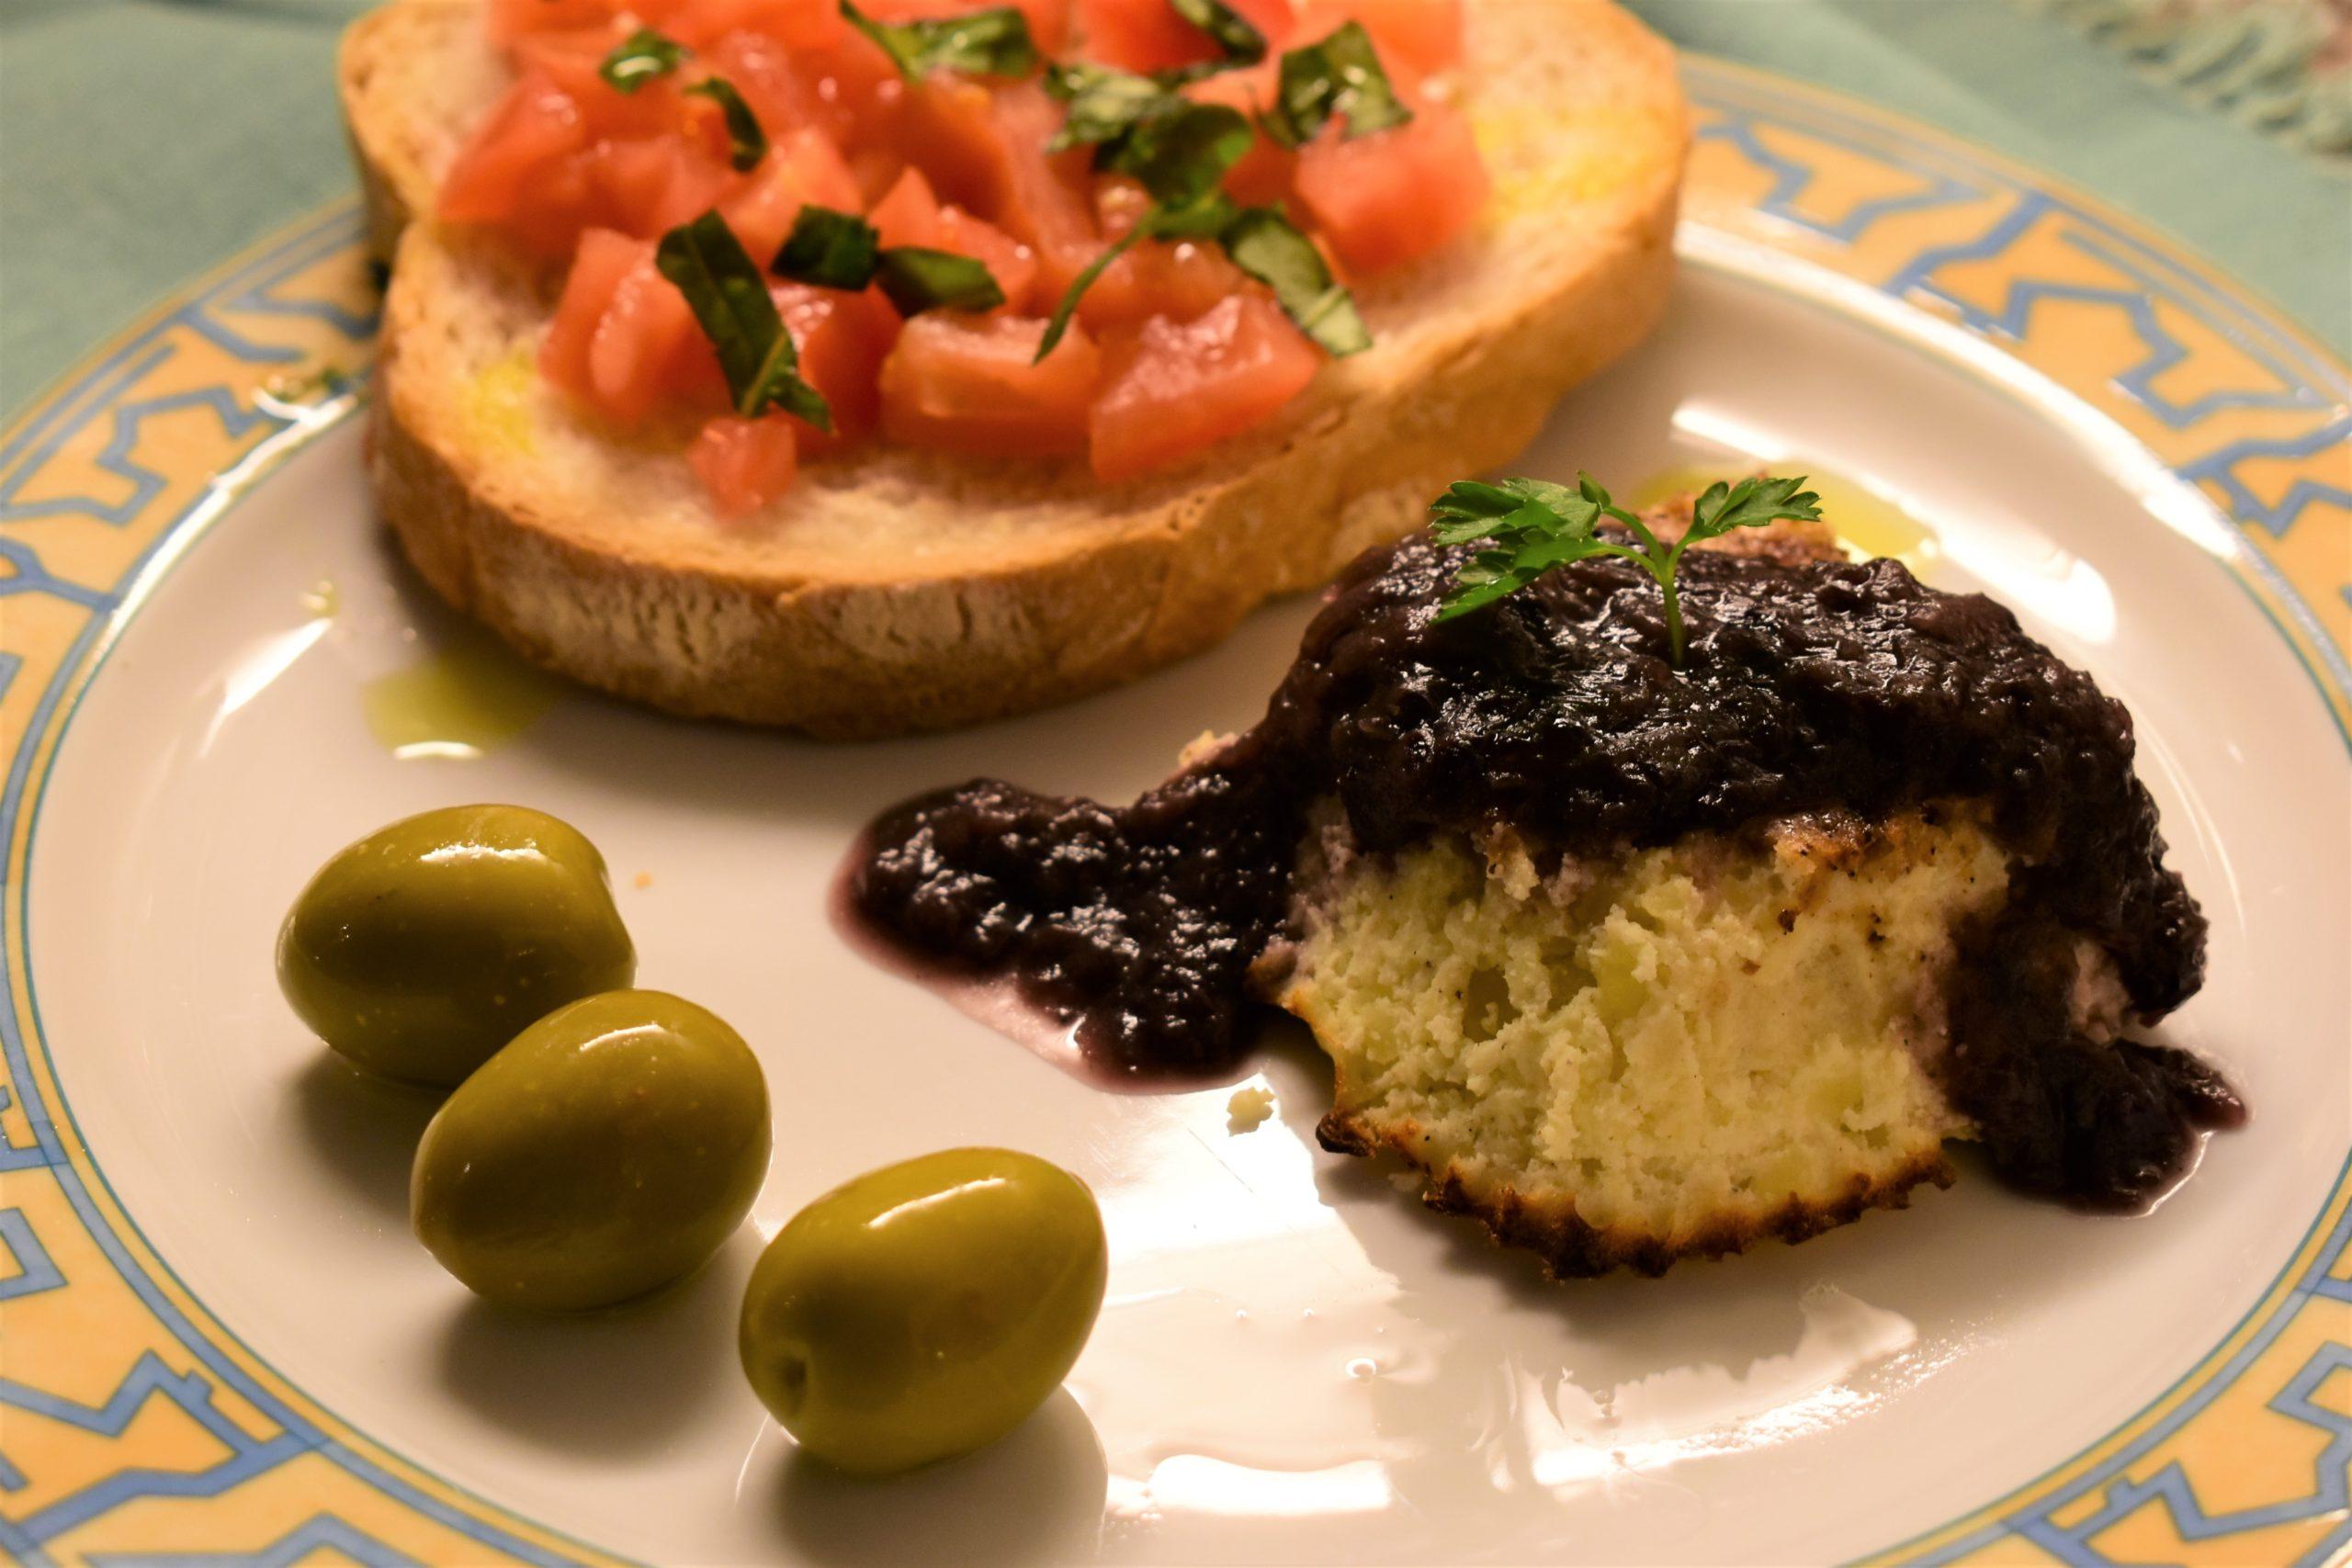 Ricotta and potatoes flan with radicchio sauce